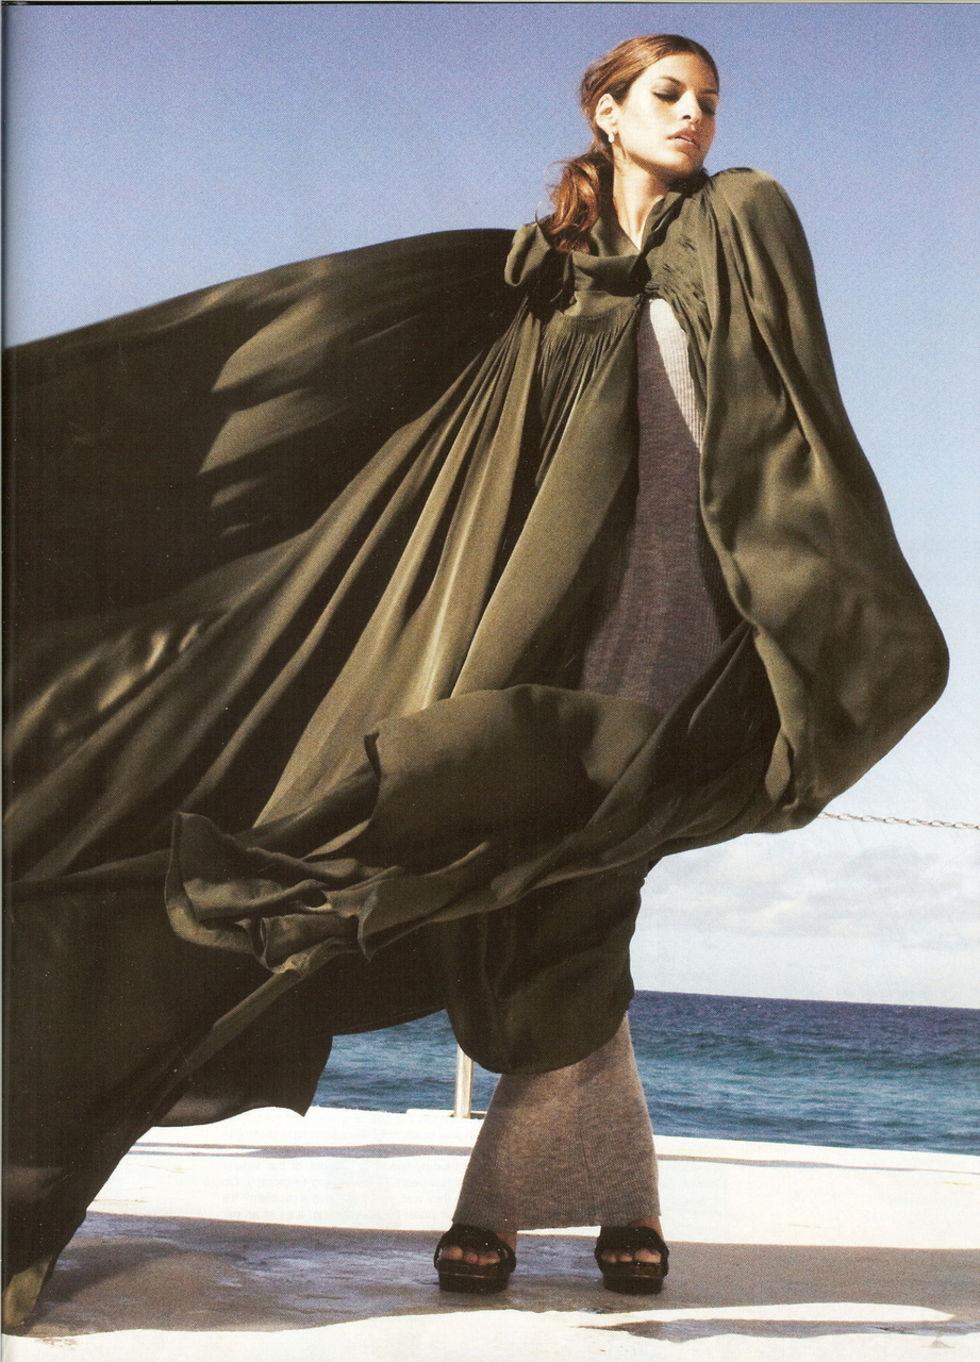 eva-mendes-harpers-bazaar-magazine-november-2008-01